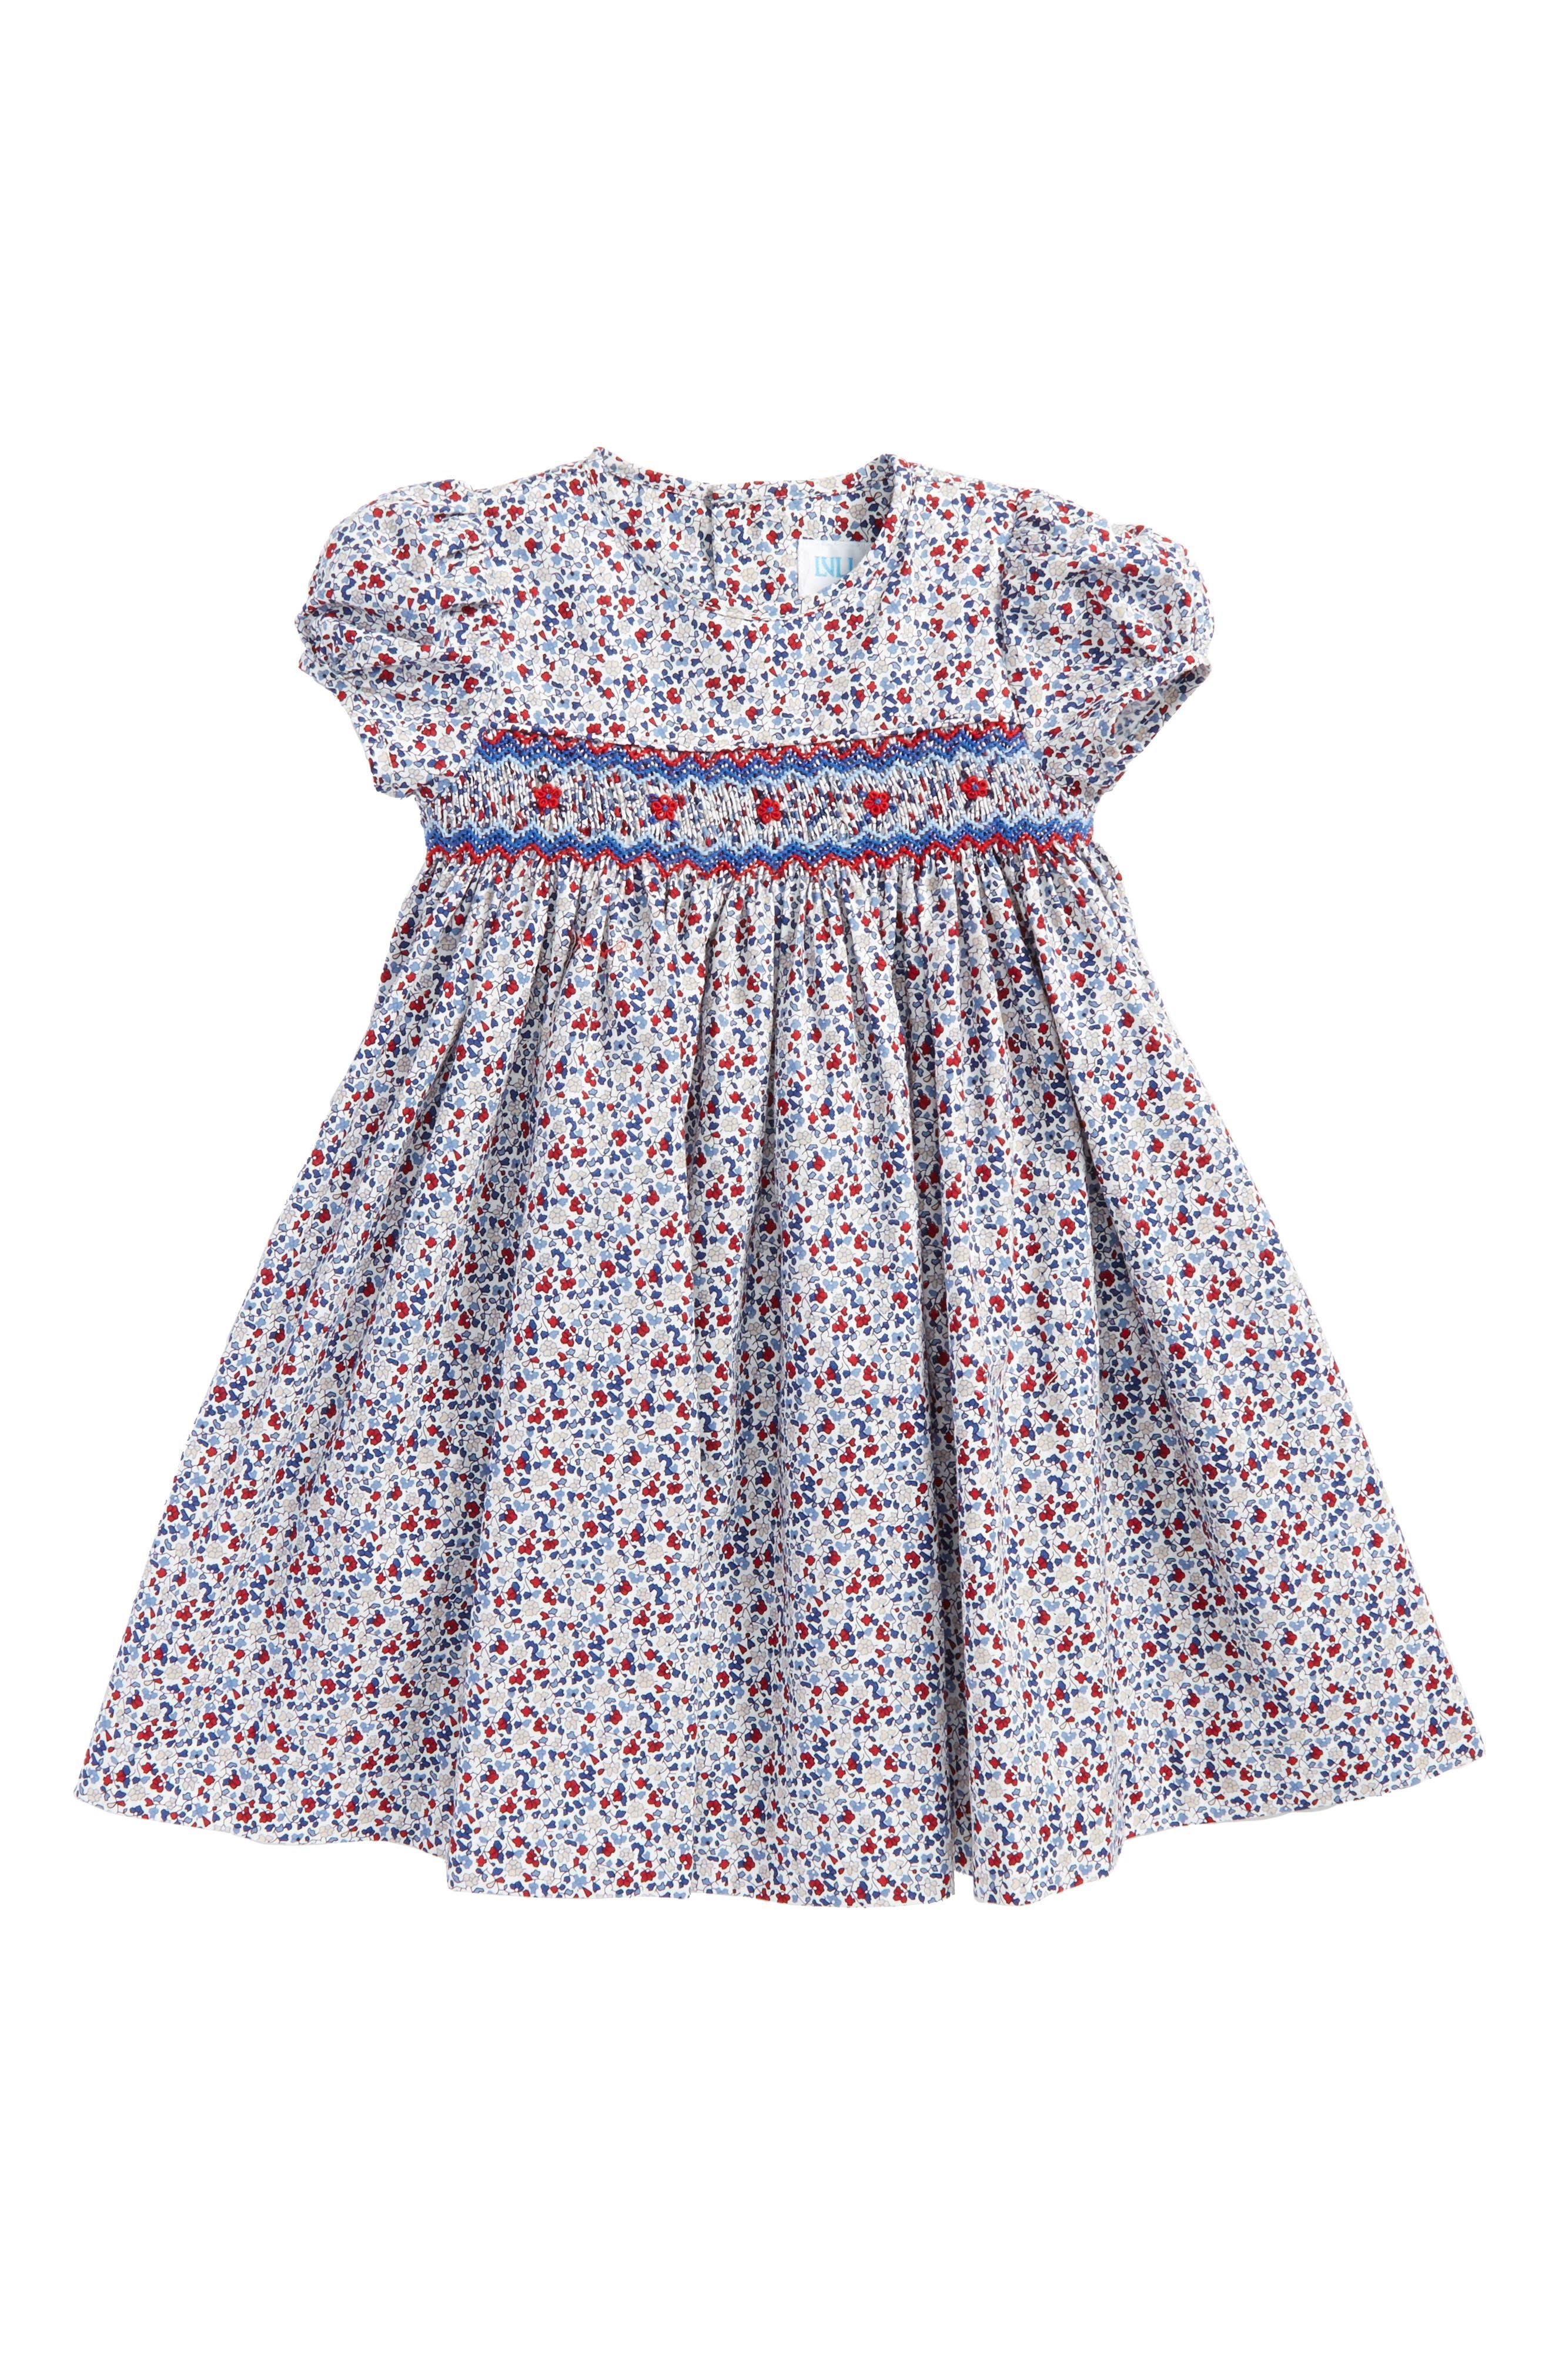 Alternate Image 1 Selected - Luli & Me Floral Smocked Dress (Baby Girls)